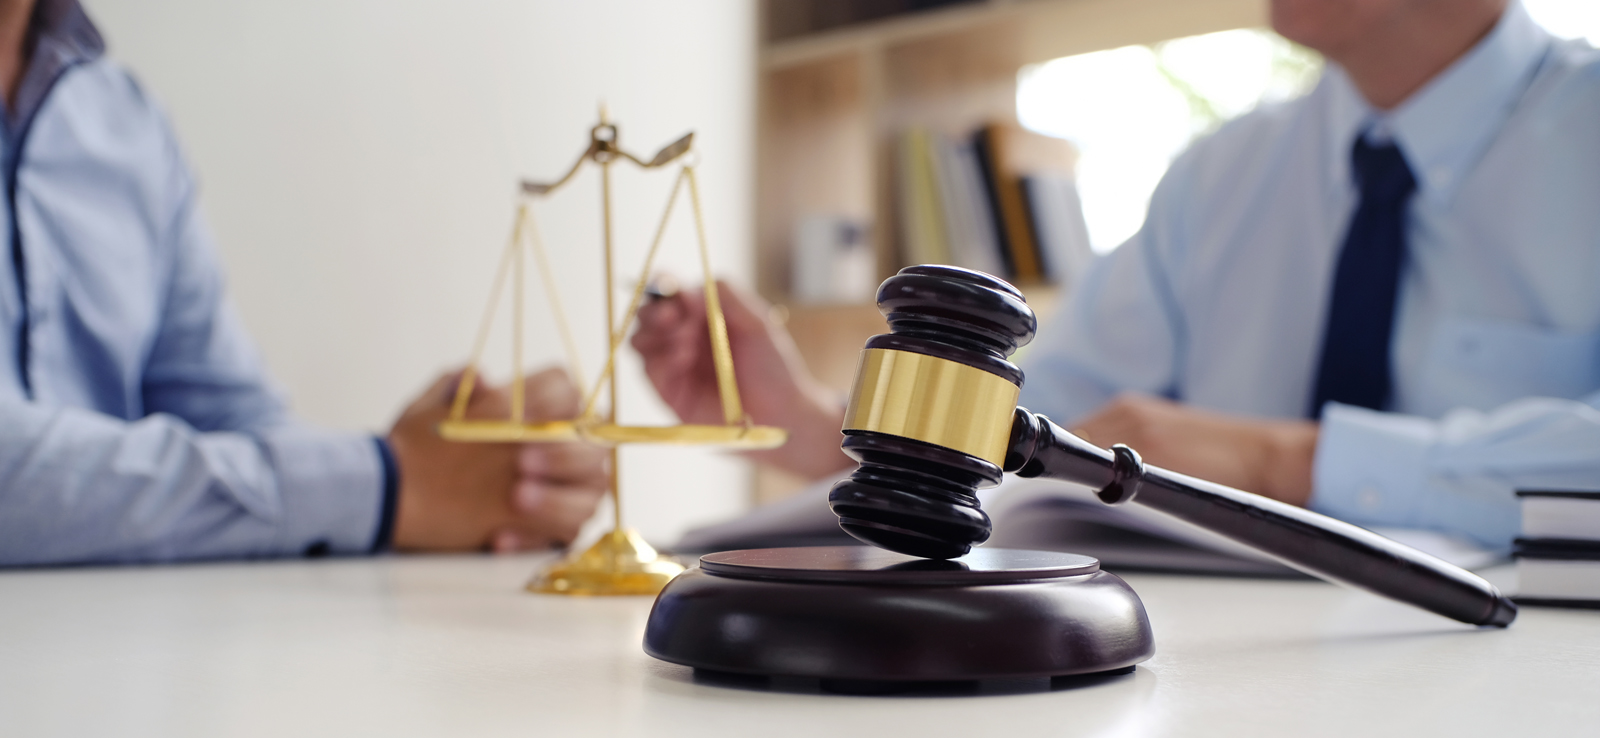 İş Hukukunun Tanımı